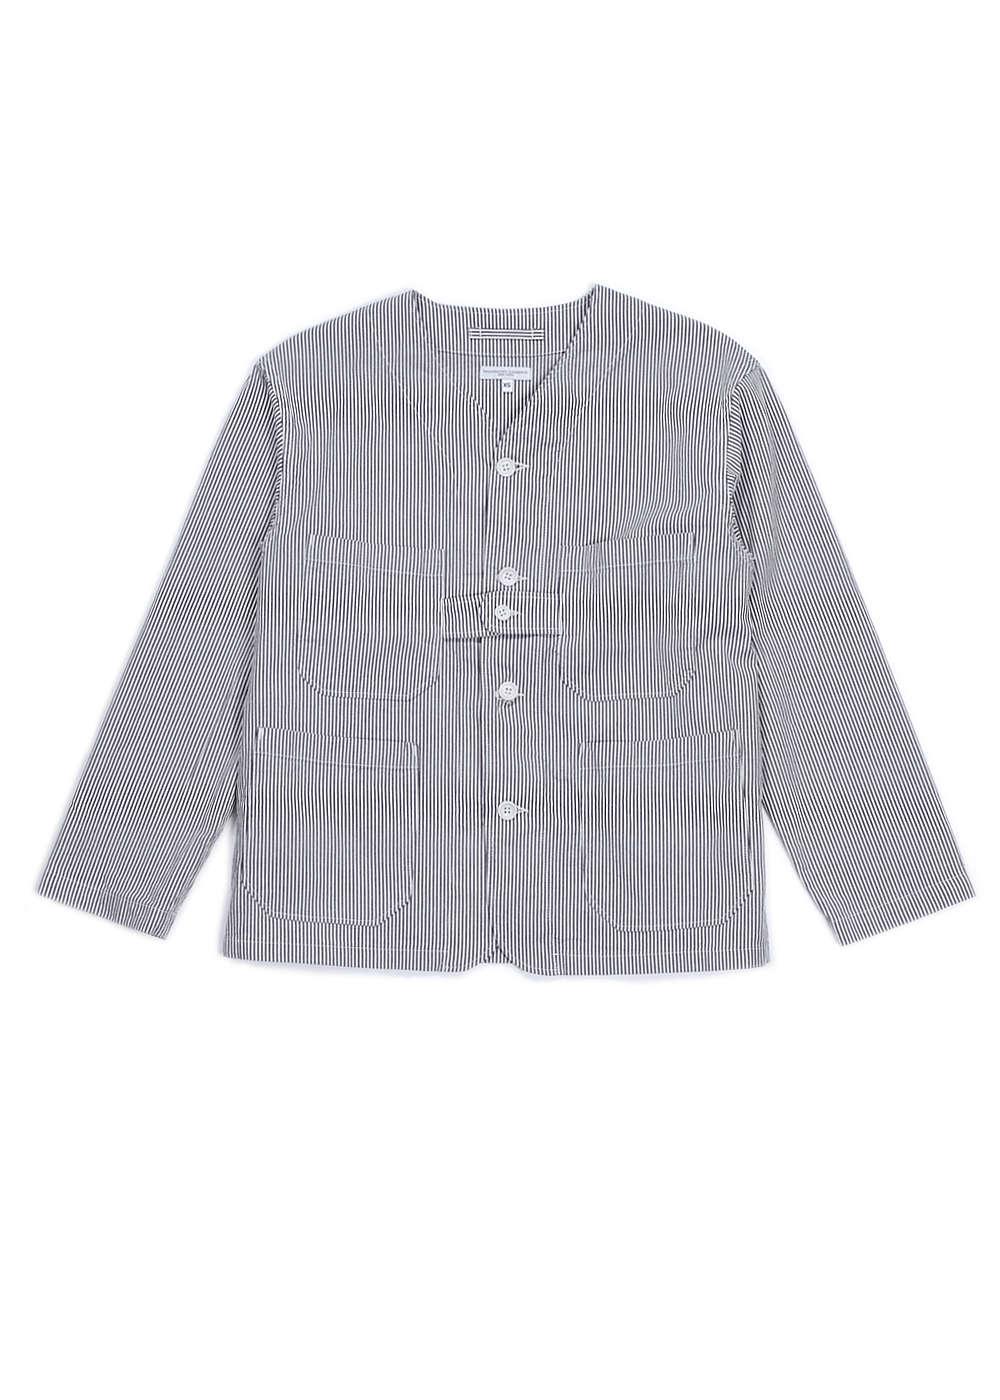 Engineered-Garments-Cardigan-Jacket-Navy-Seersucker-Stripe-01